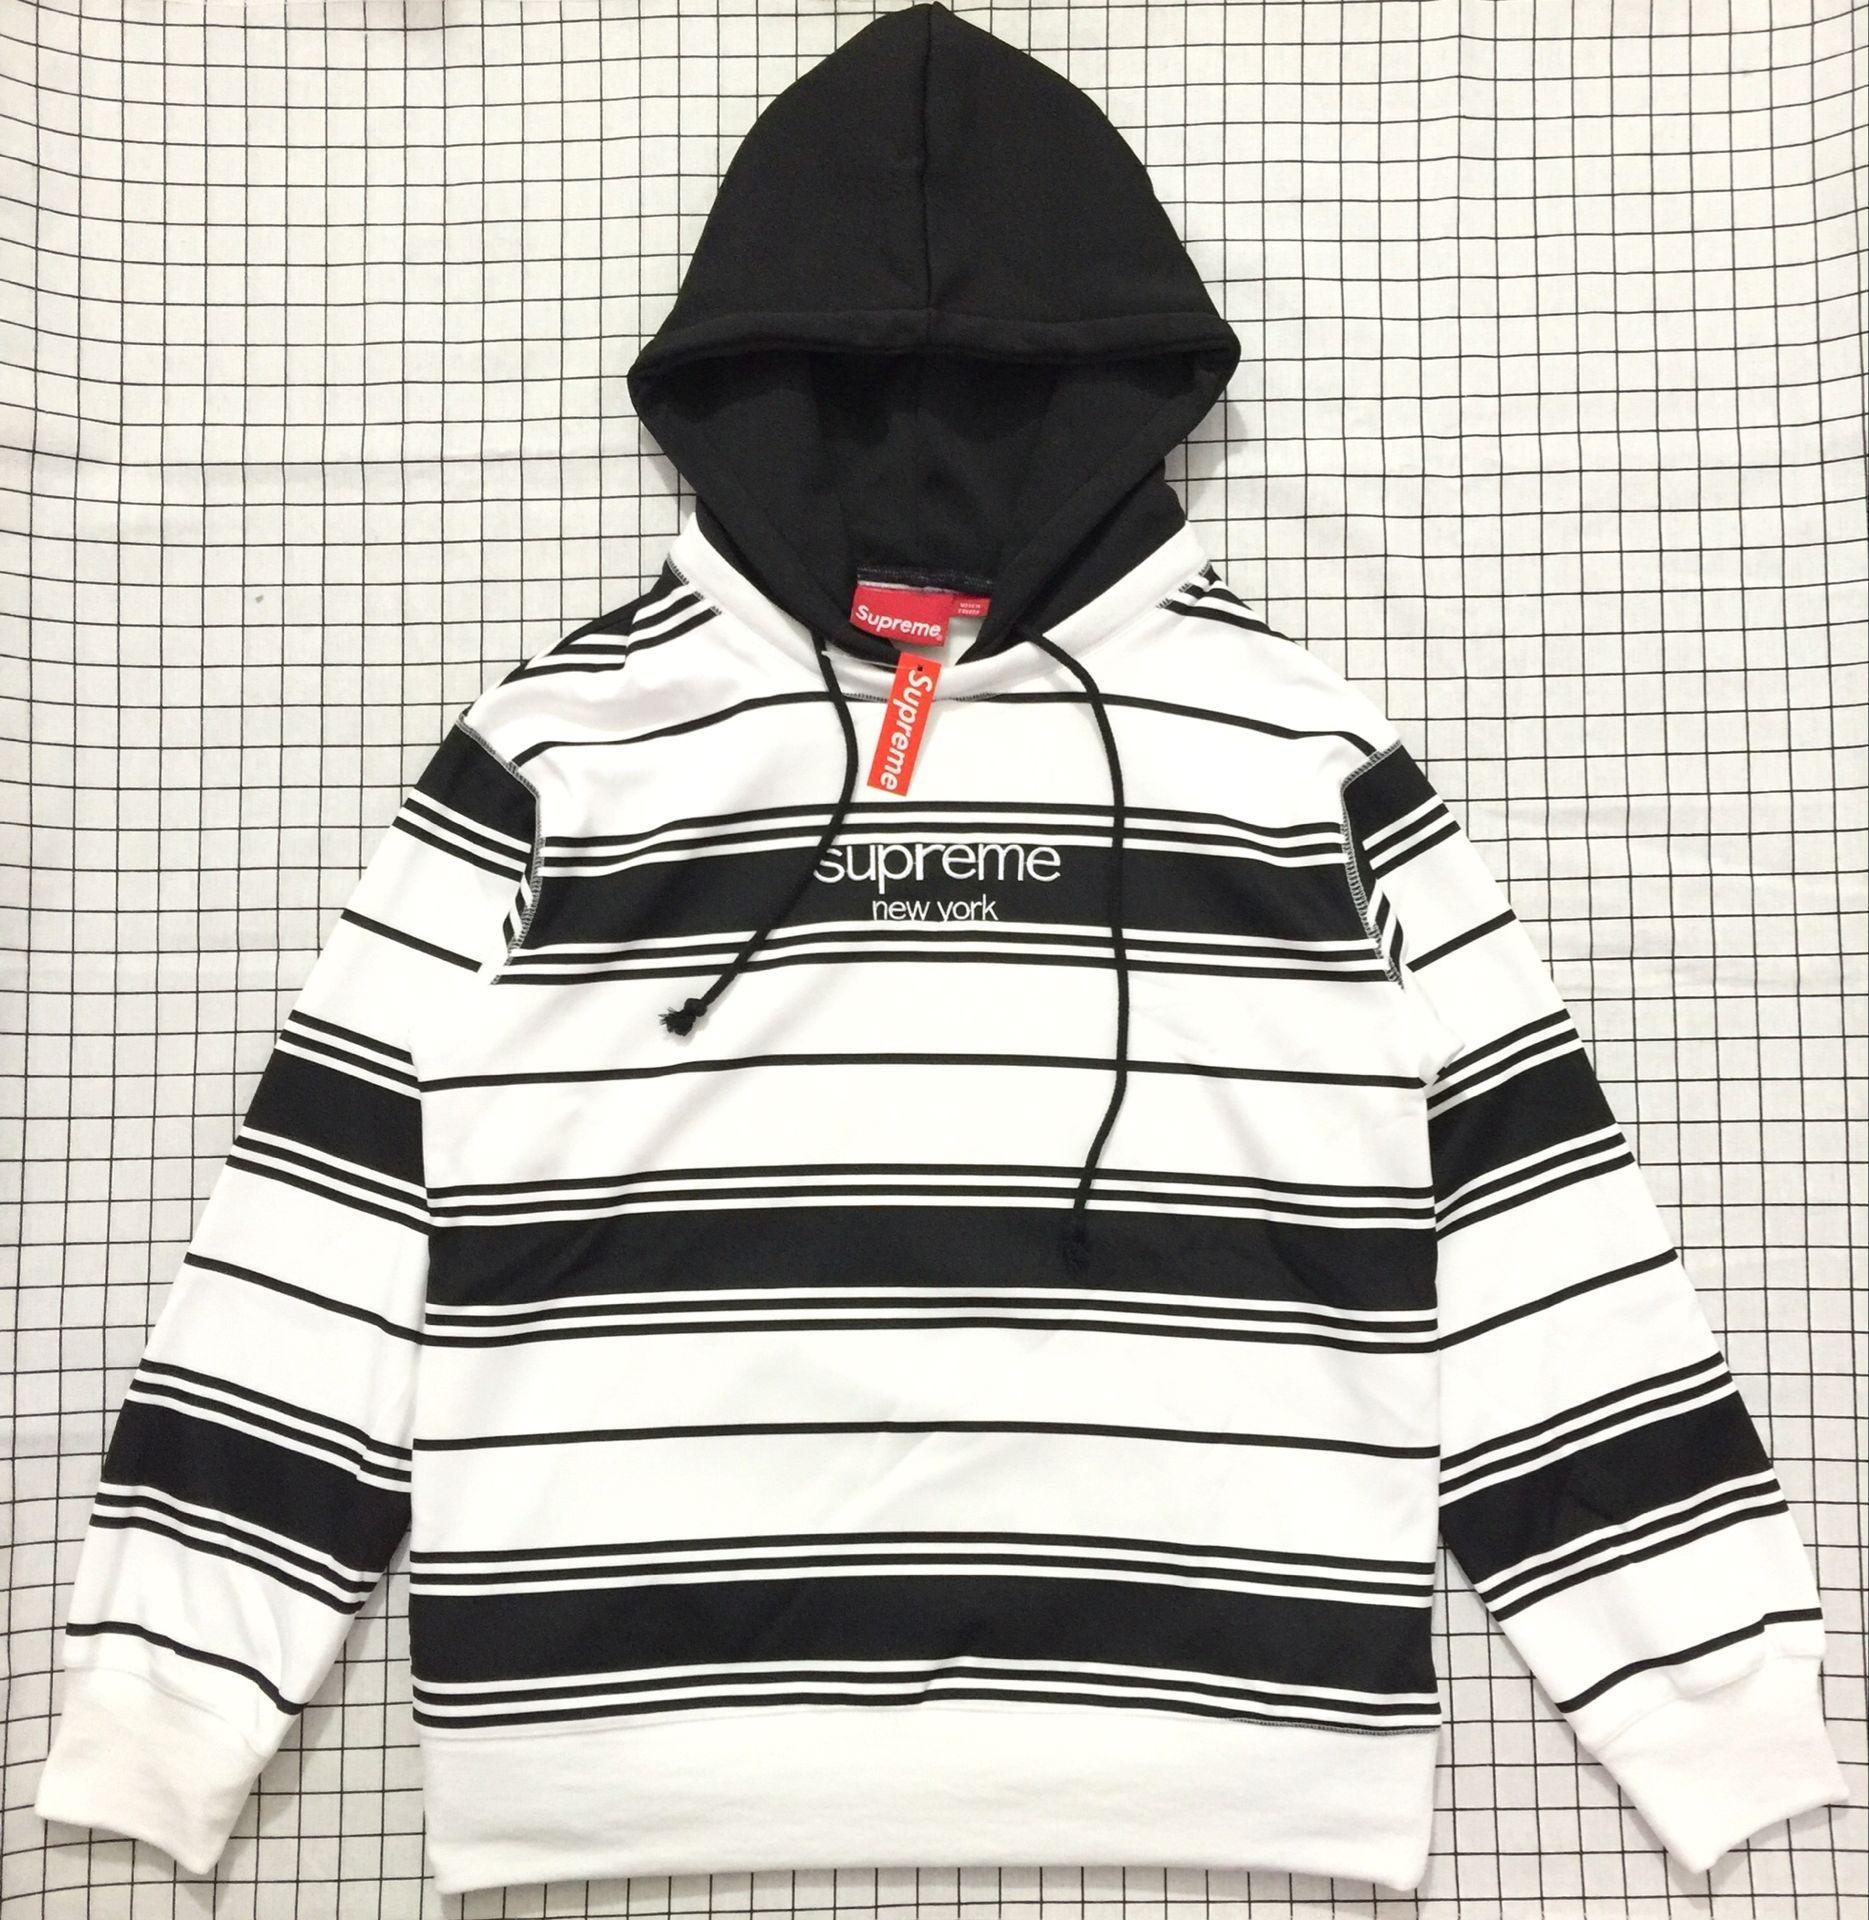 Supreme White Black Striped Hooded Crewneck Sweatshirt Supremesweatshirts Supremeoutfits Supremehoodie Whiteblackstripedsweater Http Www Sanalpazar Urunler [ 1920 x 1869 Pixel ]